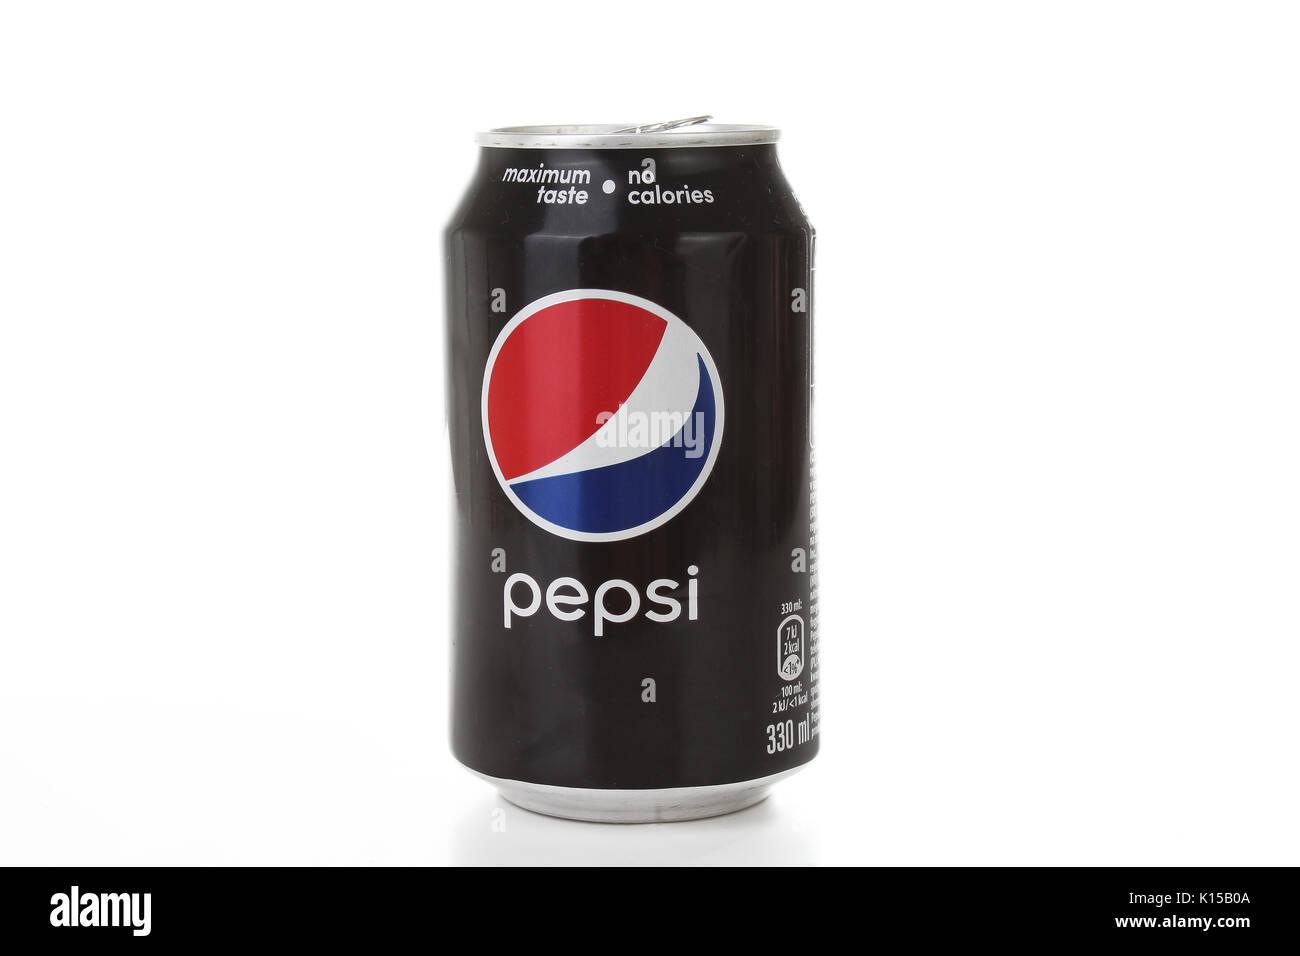 Original pepsi can